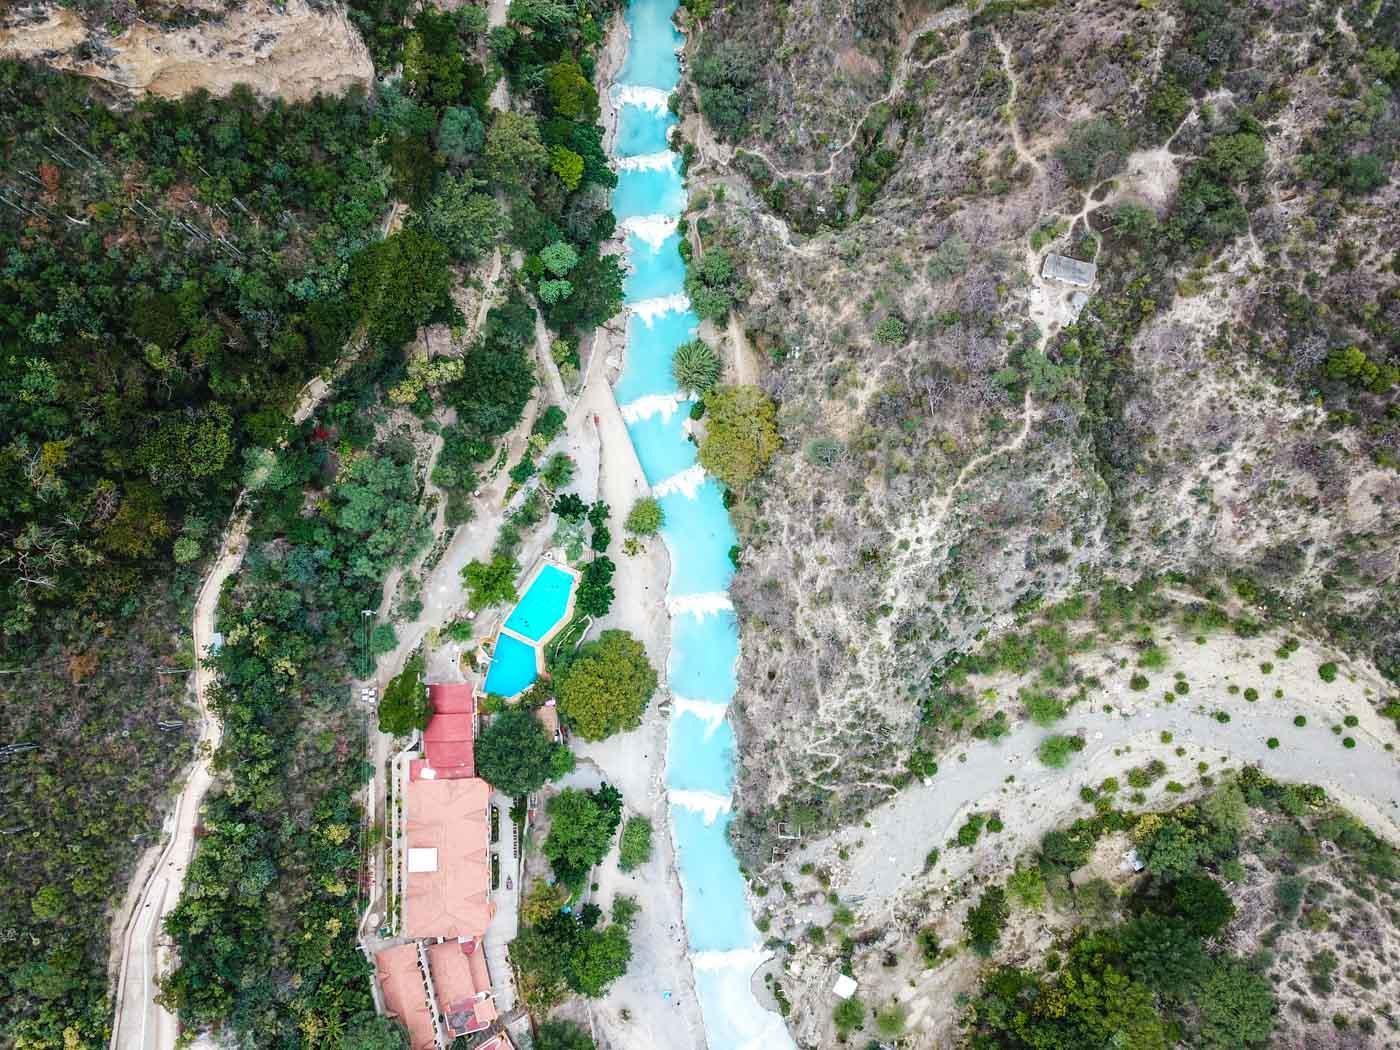 Grutos_Tolartongo_Mexico_City_Thermal_Hot_Springs_Mountains_Road_Trip_America_Blogs_Travel_Guide